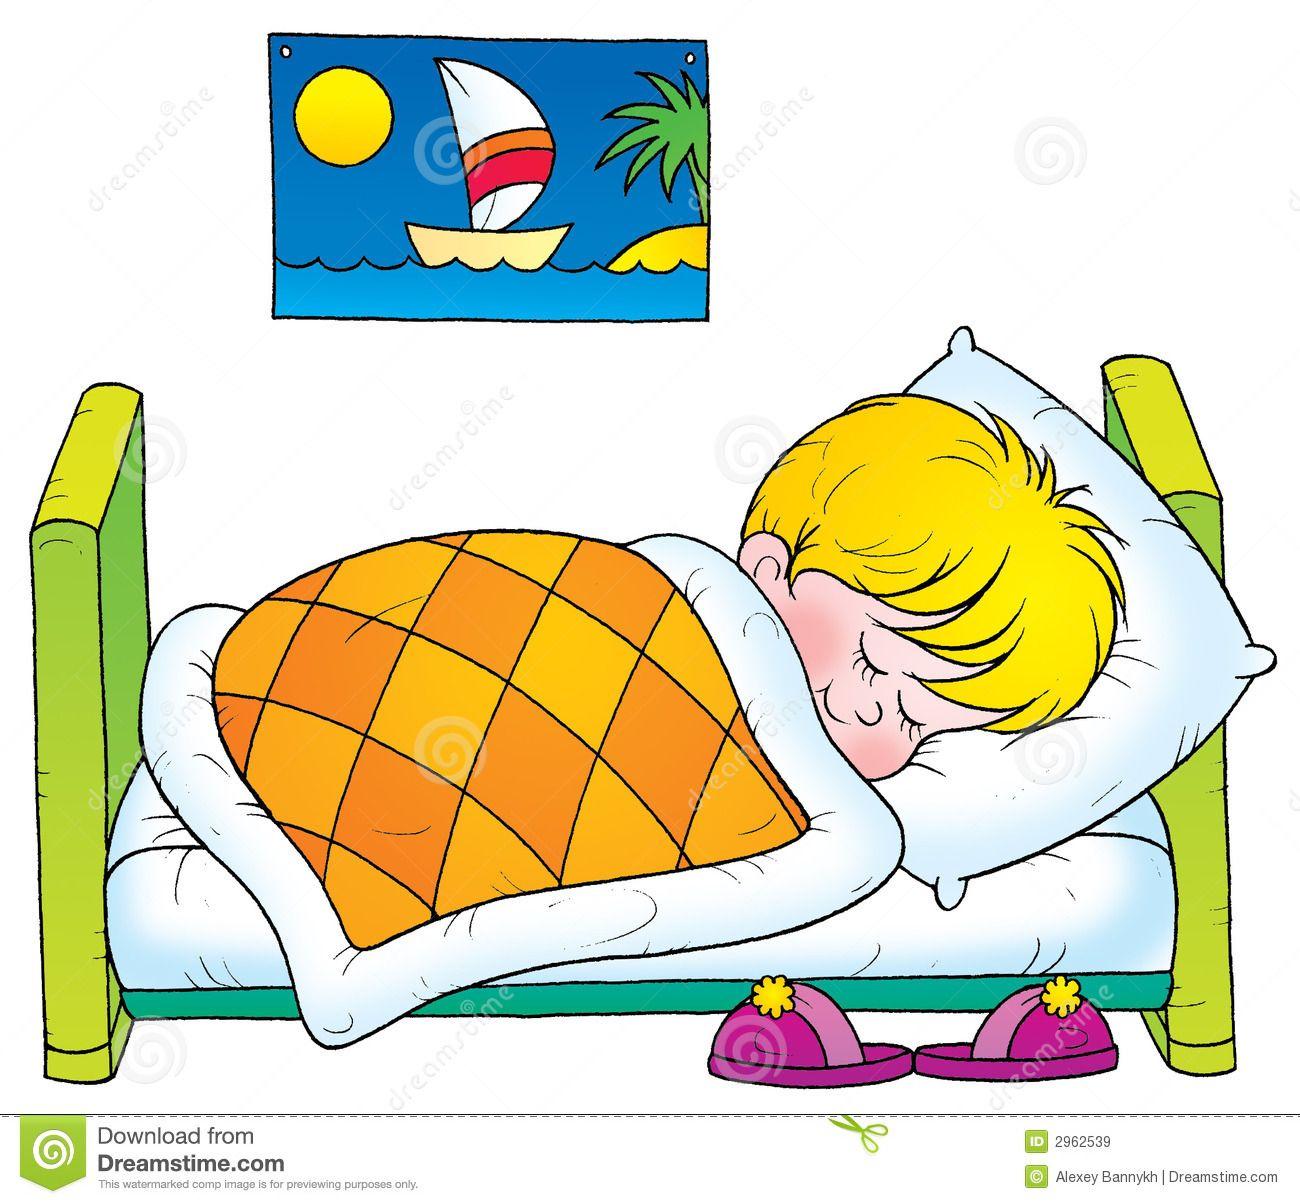 Clipart bed proper sleep. Health cliparts suc khoe